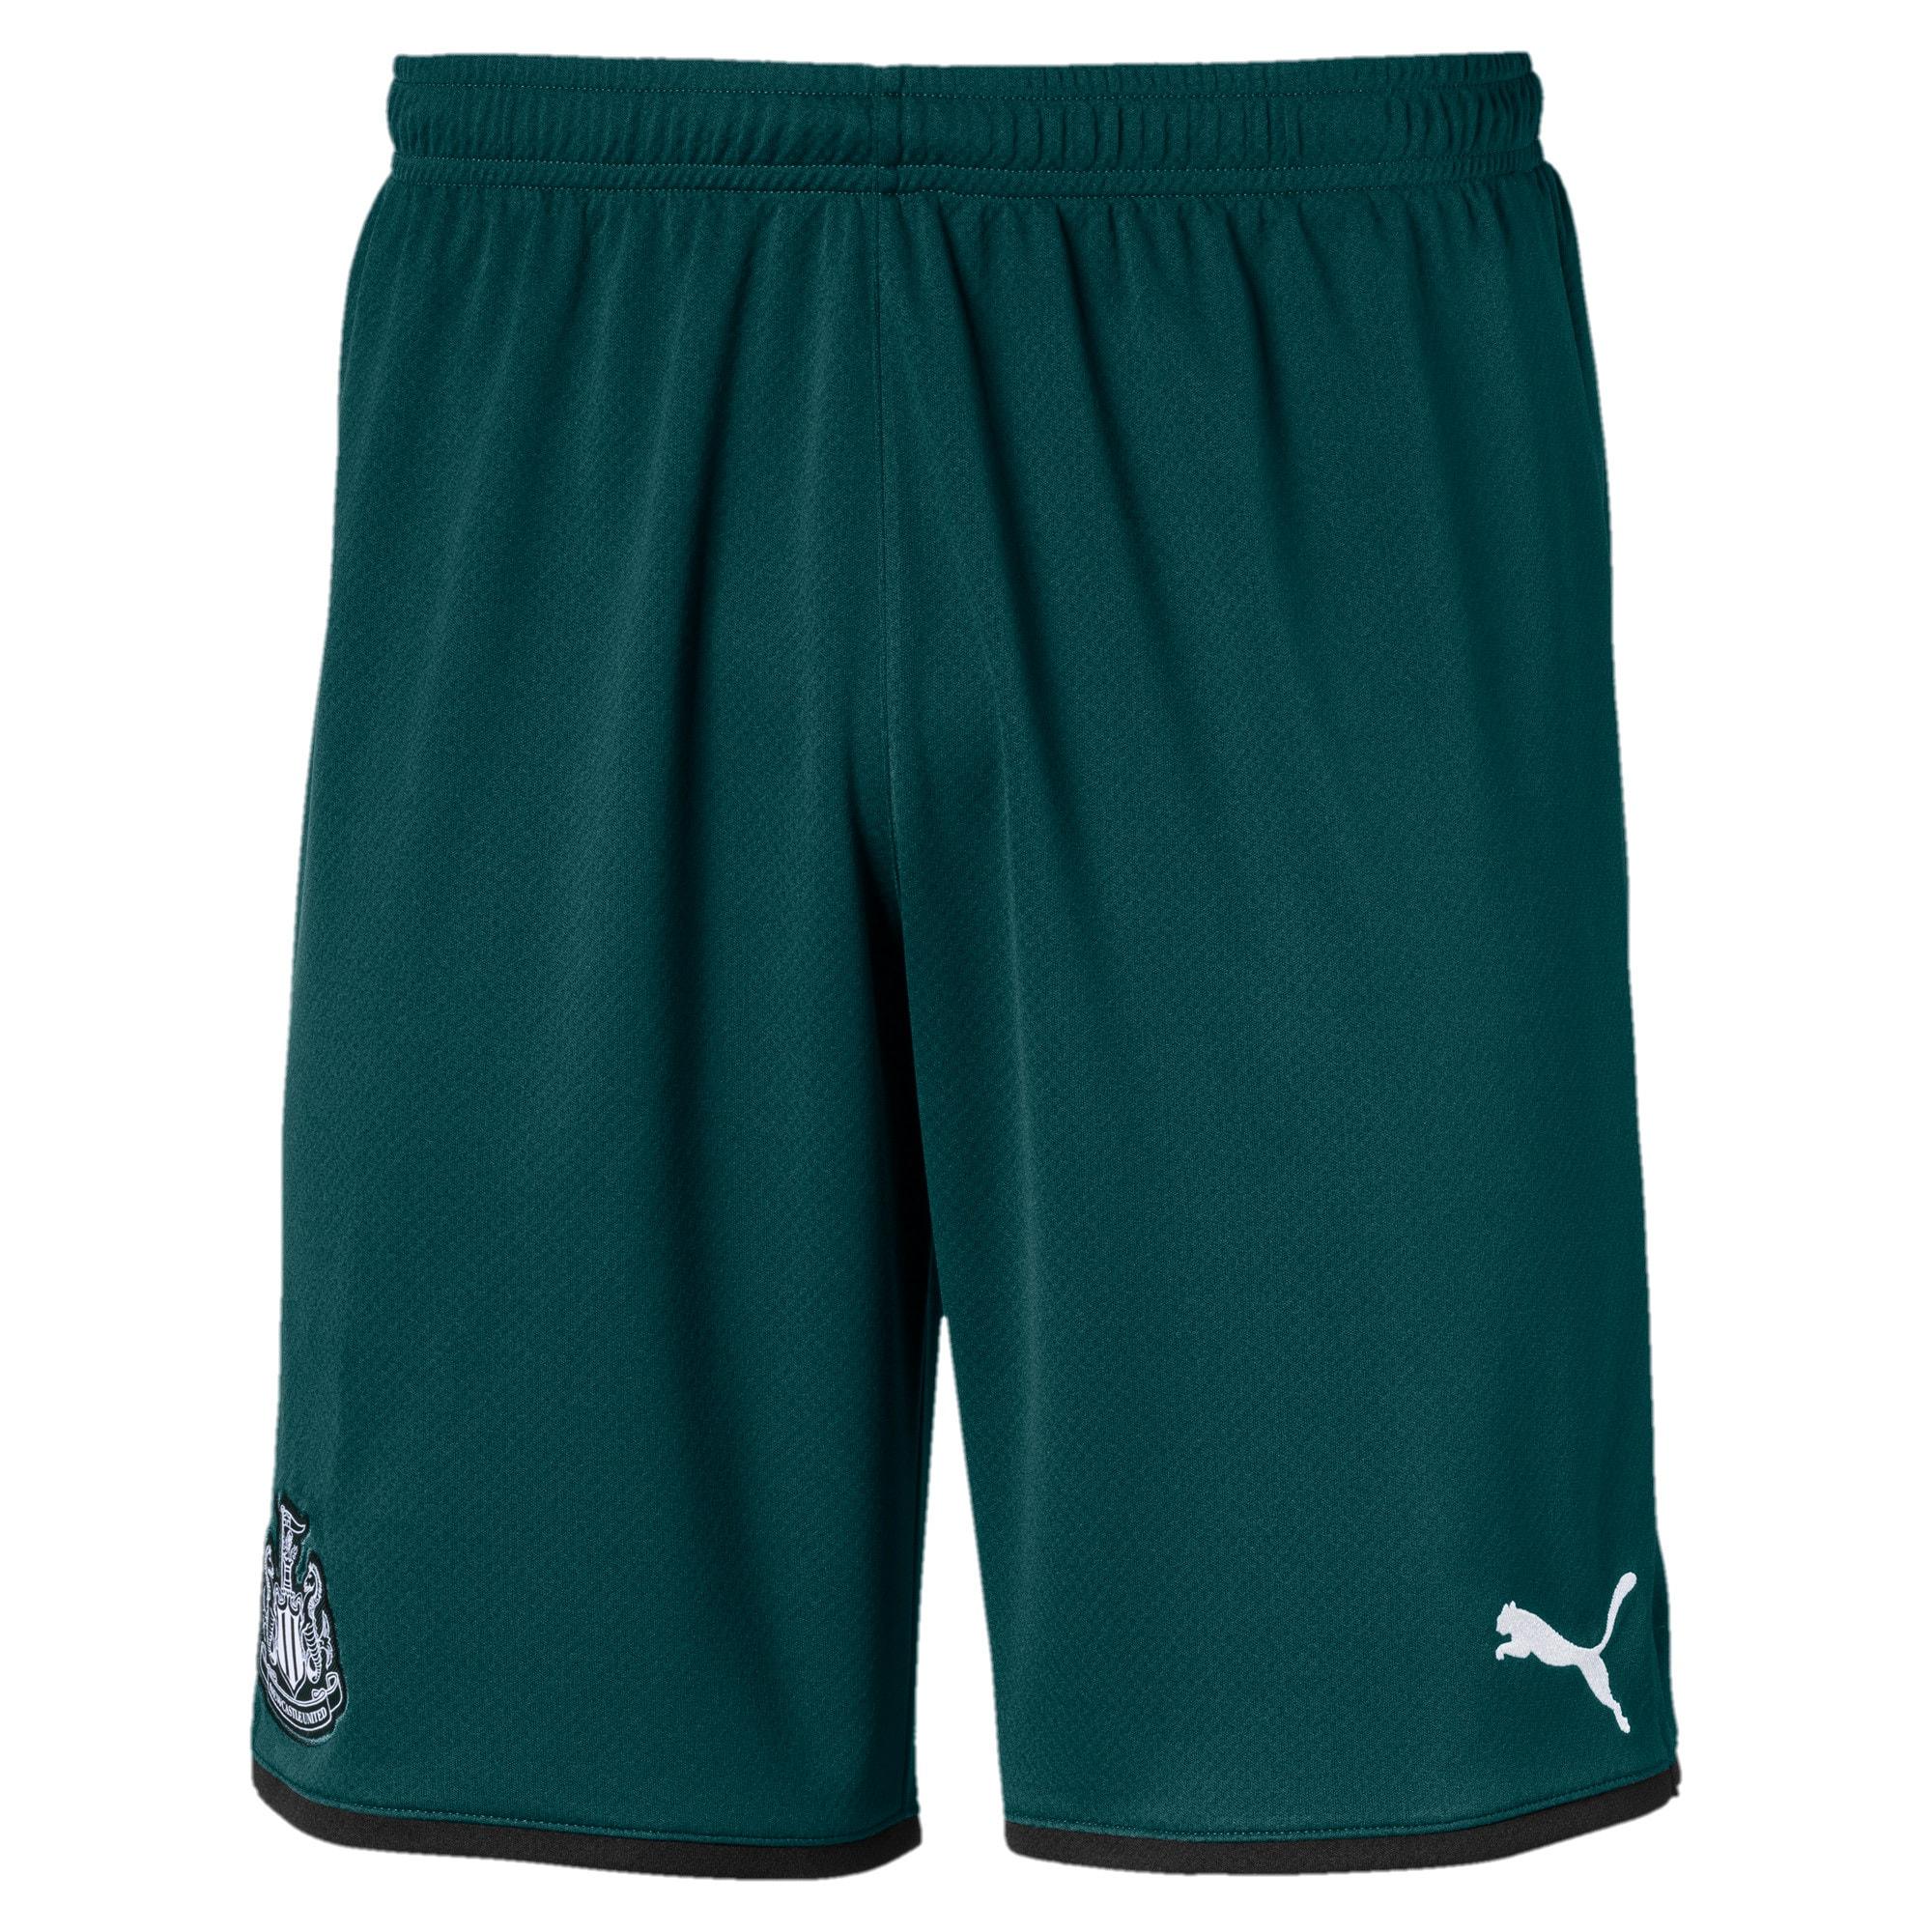 Thumbnail 1 of Newcastle United FC Men's Replica Shorts, Ponderosa Pine-Puma Black, medium